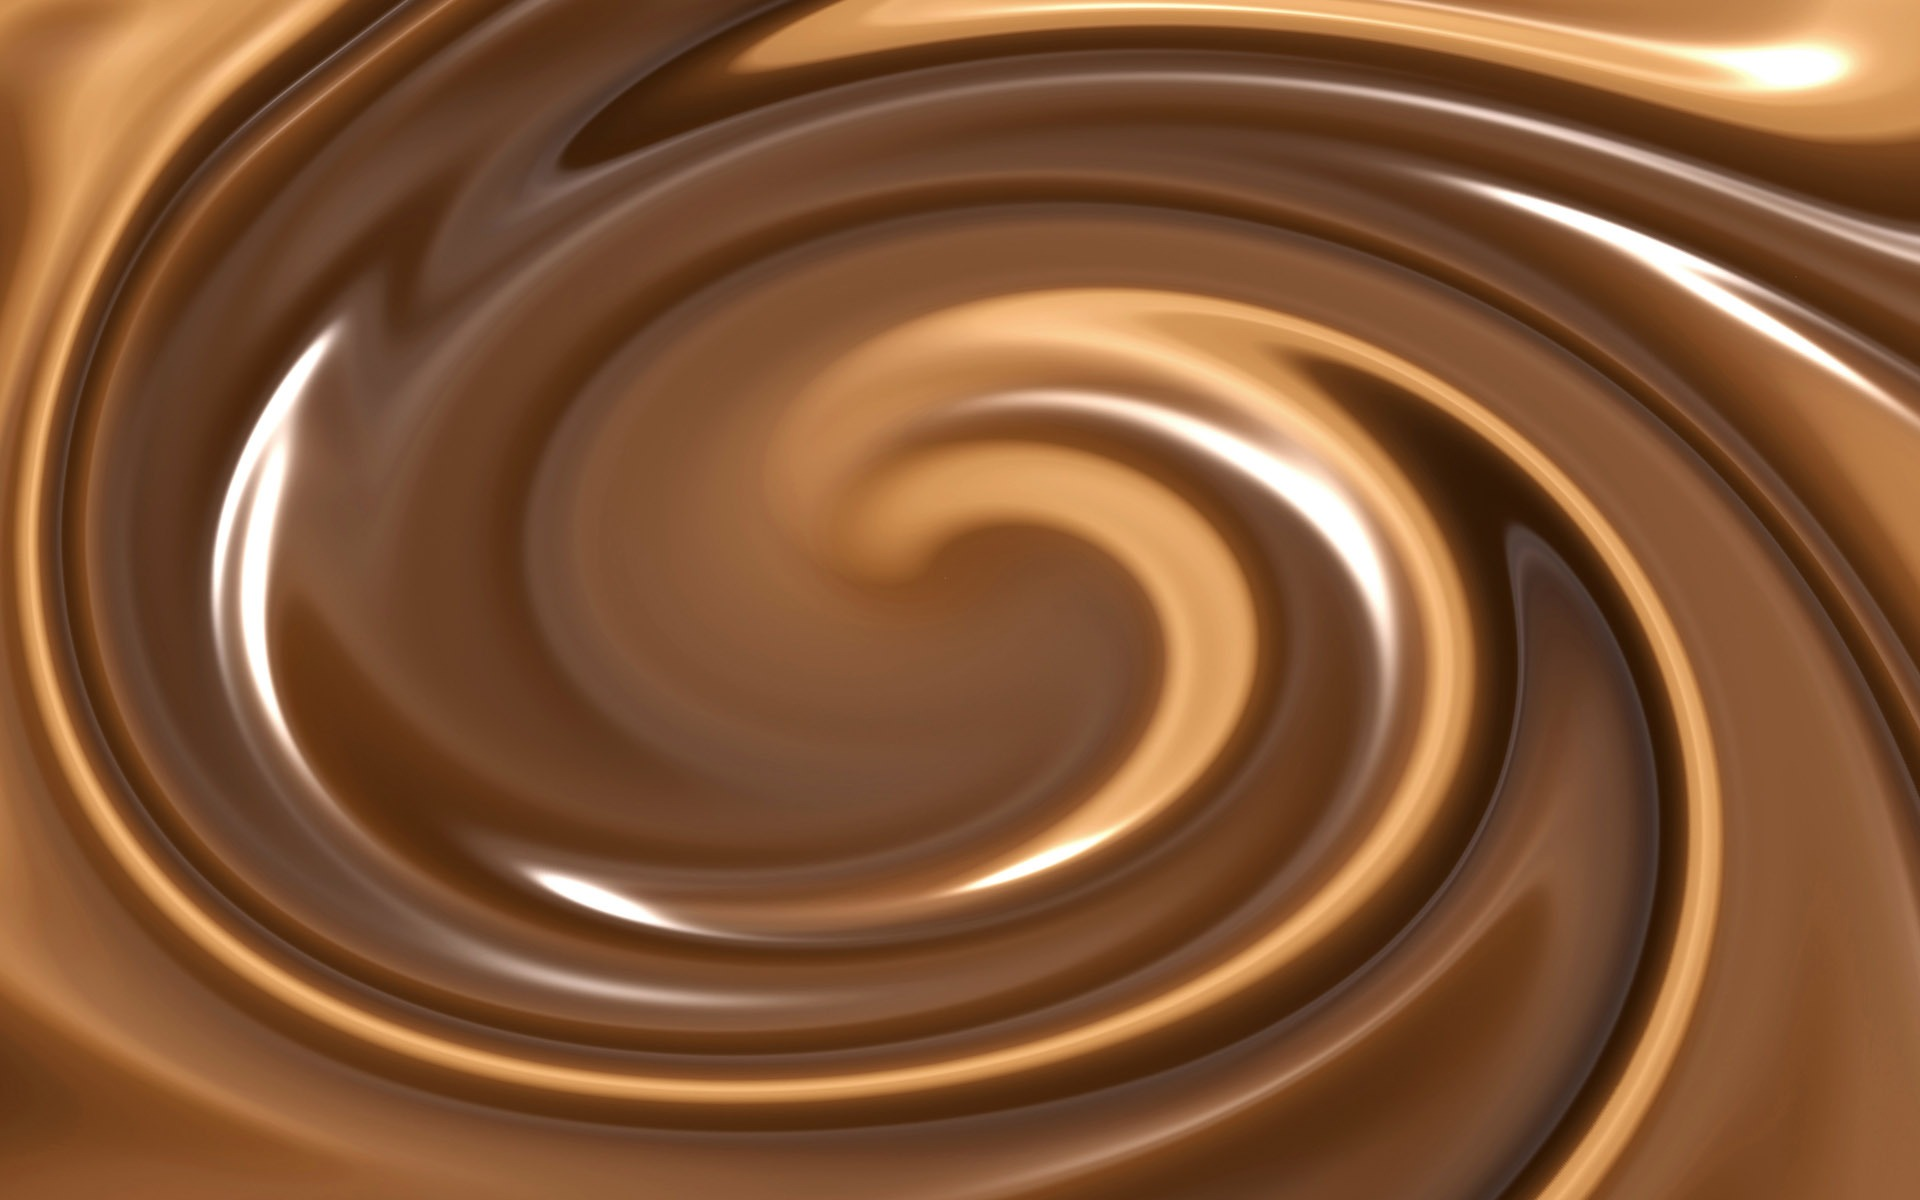 Fondos De Pantalla De Chocolates: Chocolate Plano De Fondo (1) #10